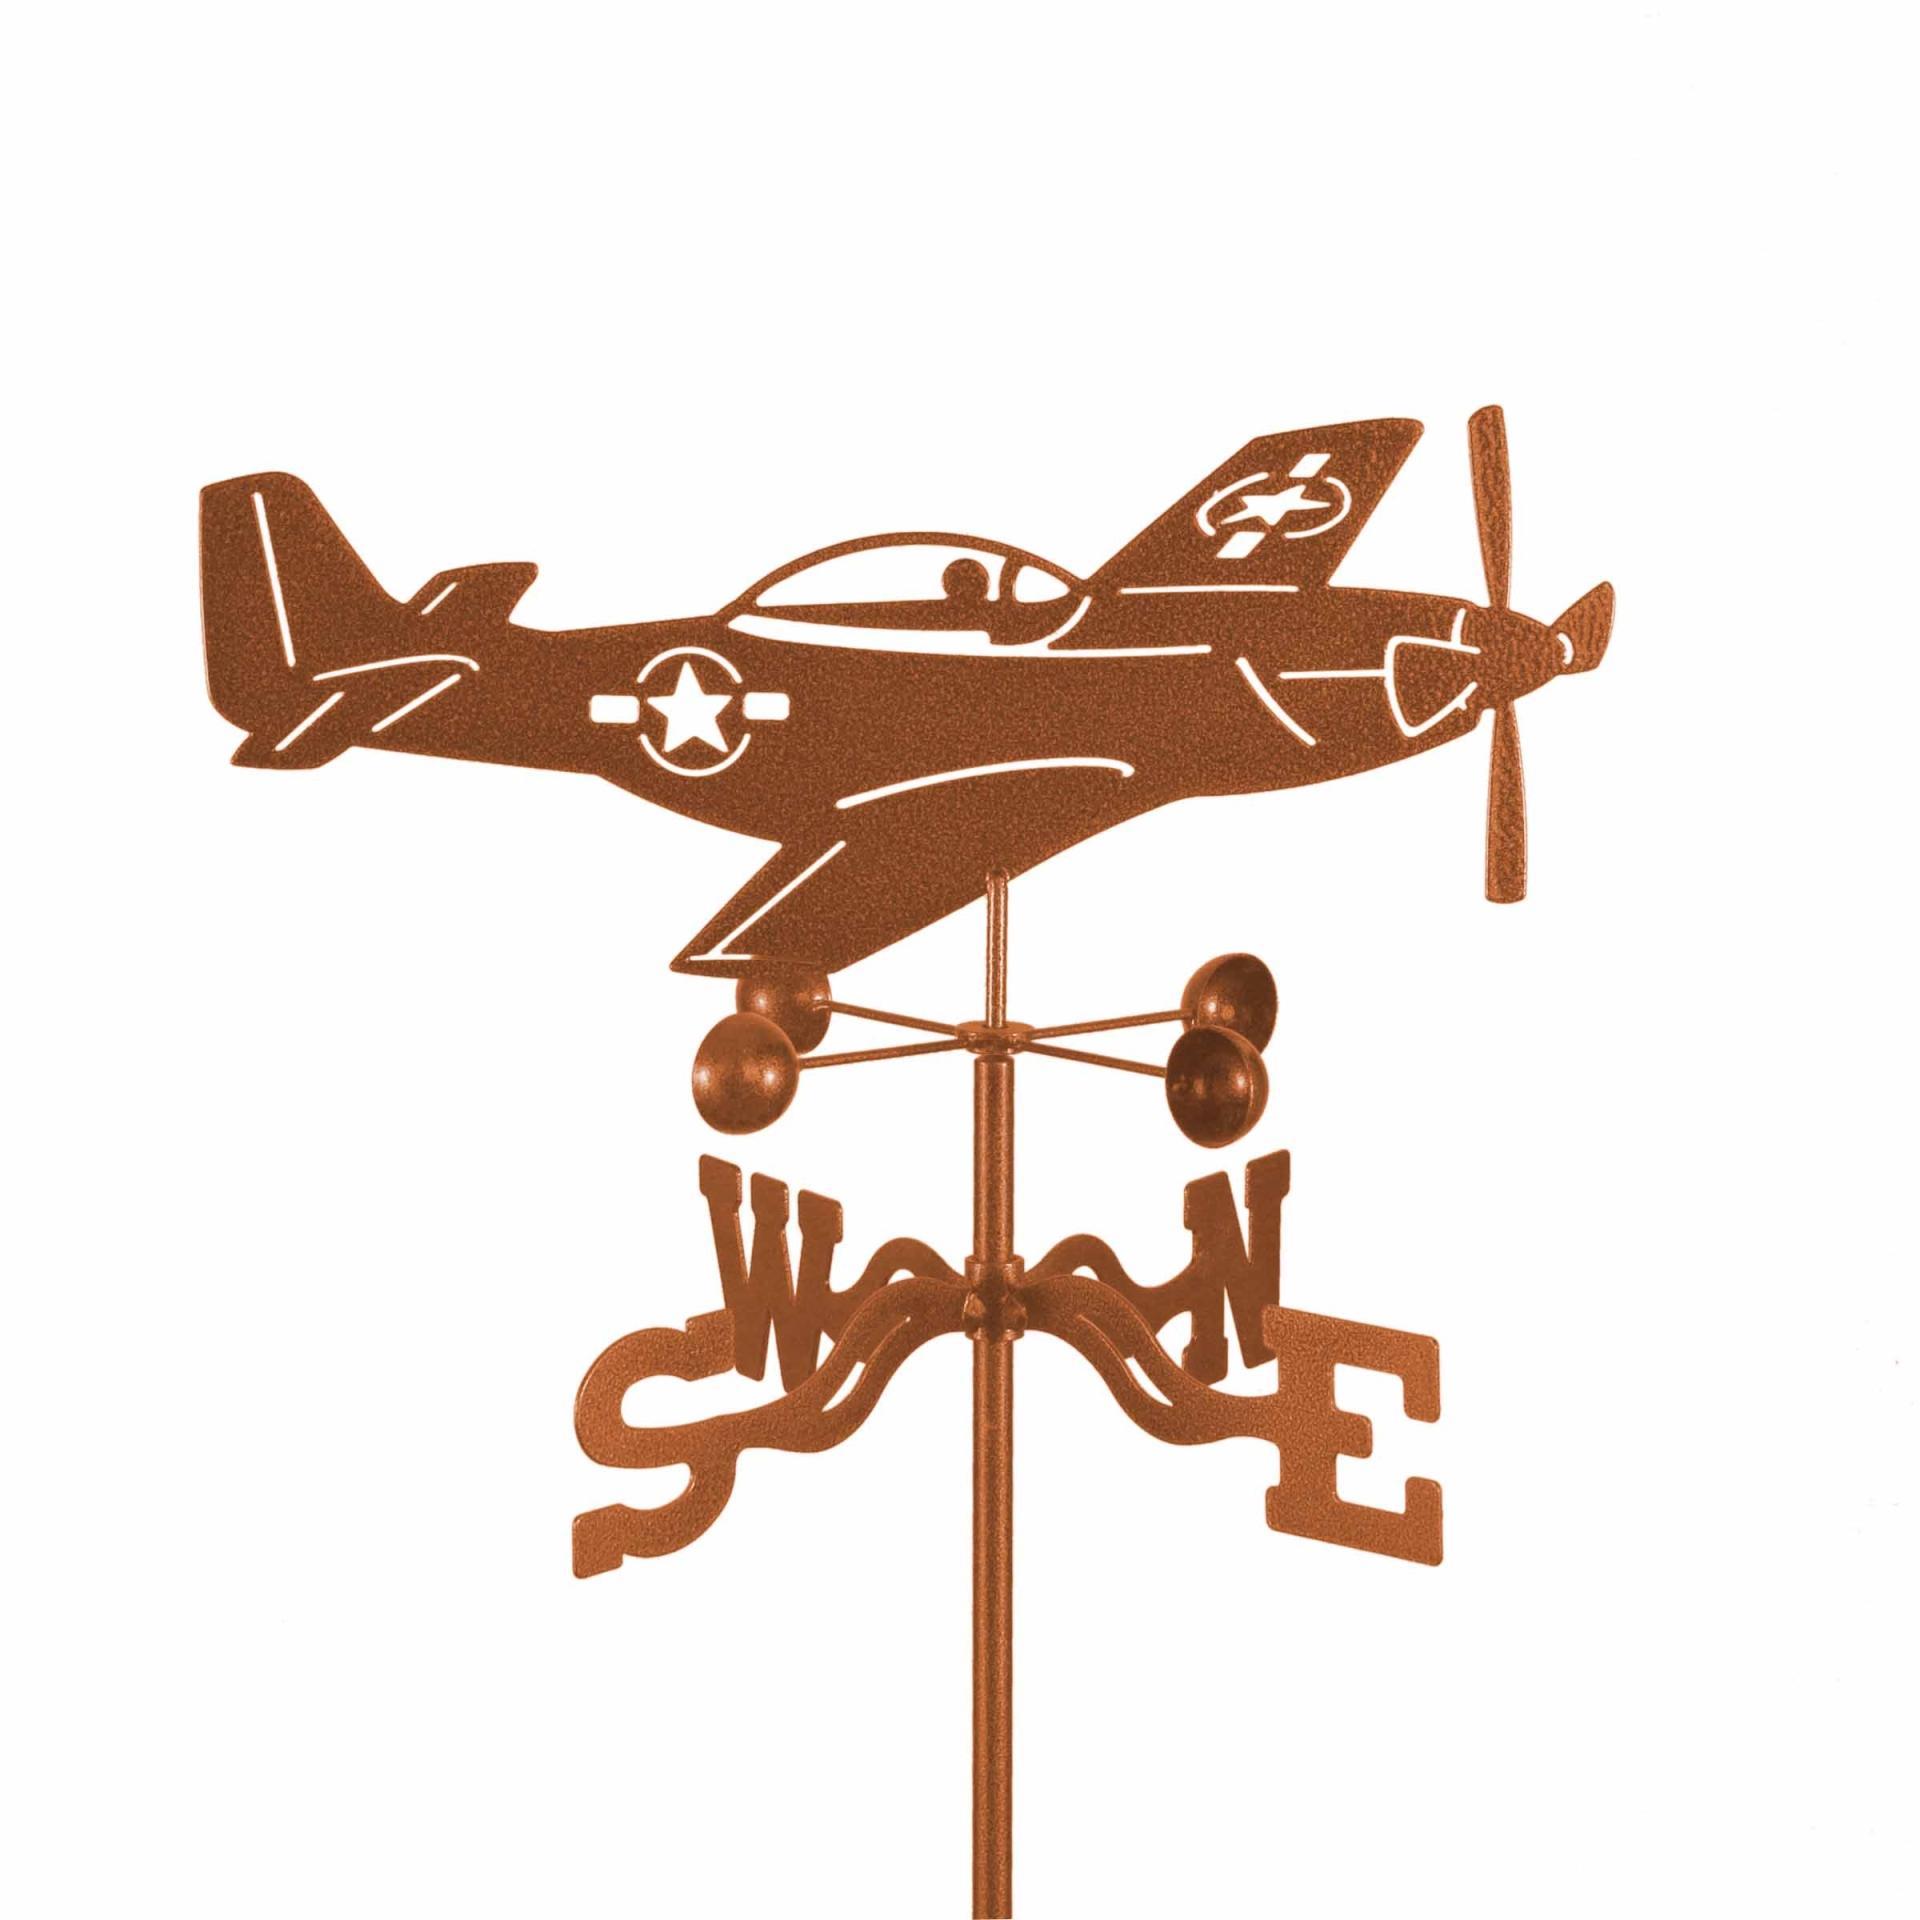 P-51 Mustang Airplane Weathervane-0